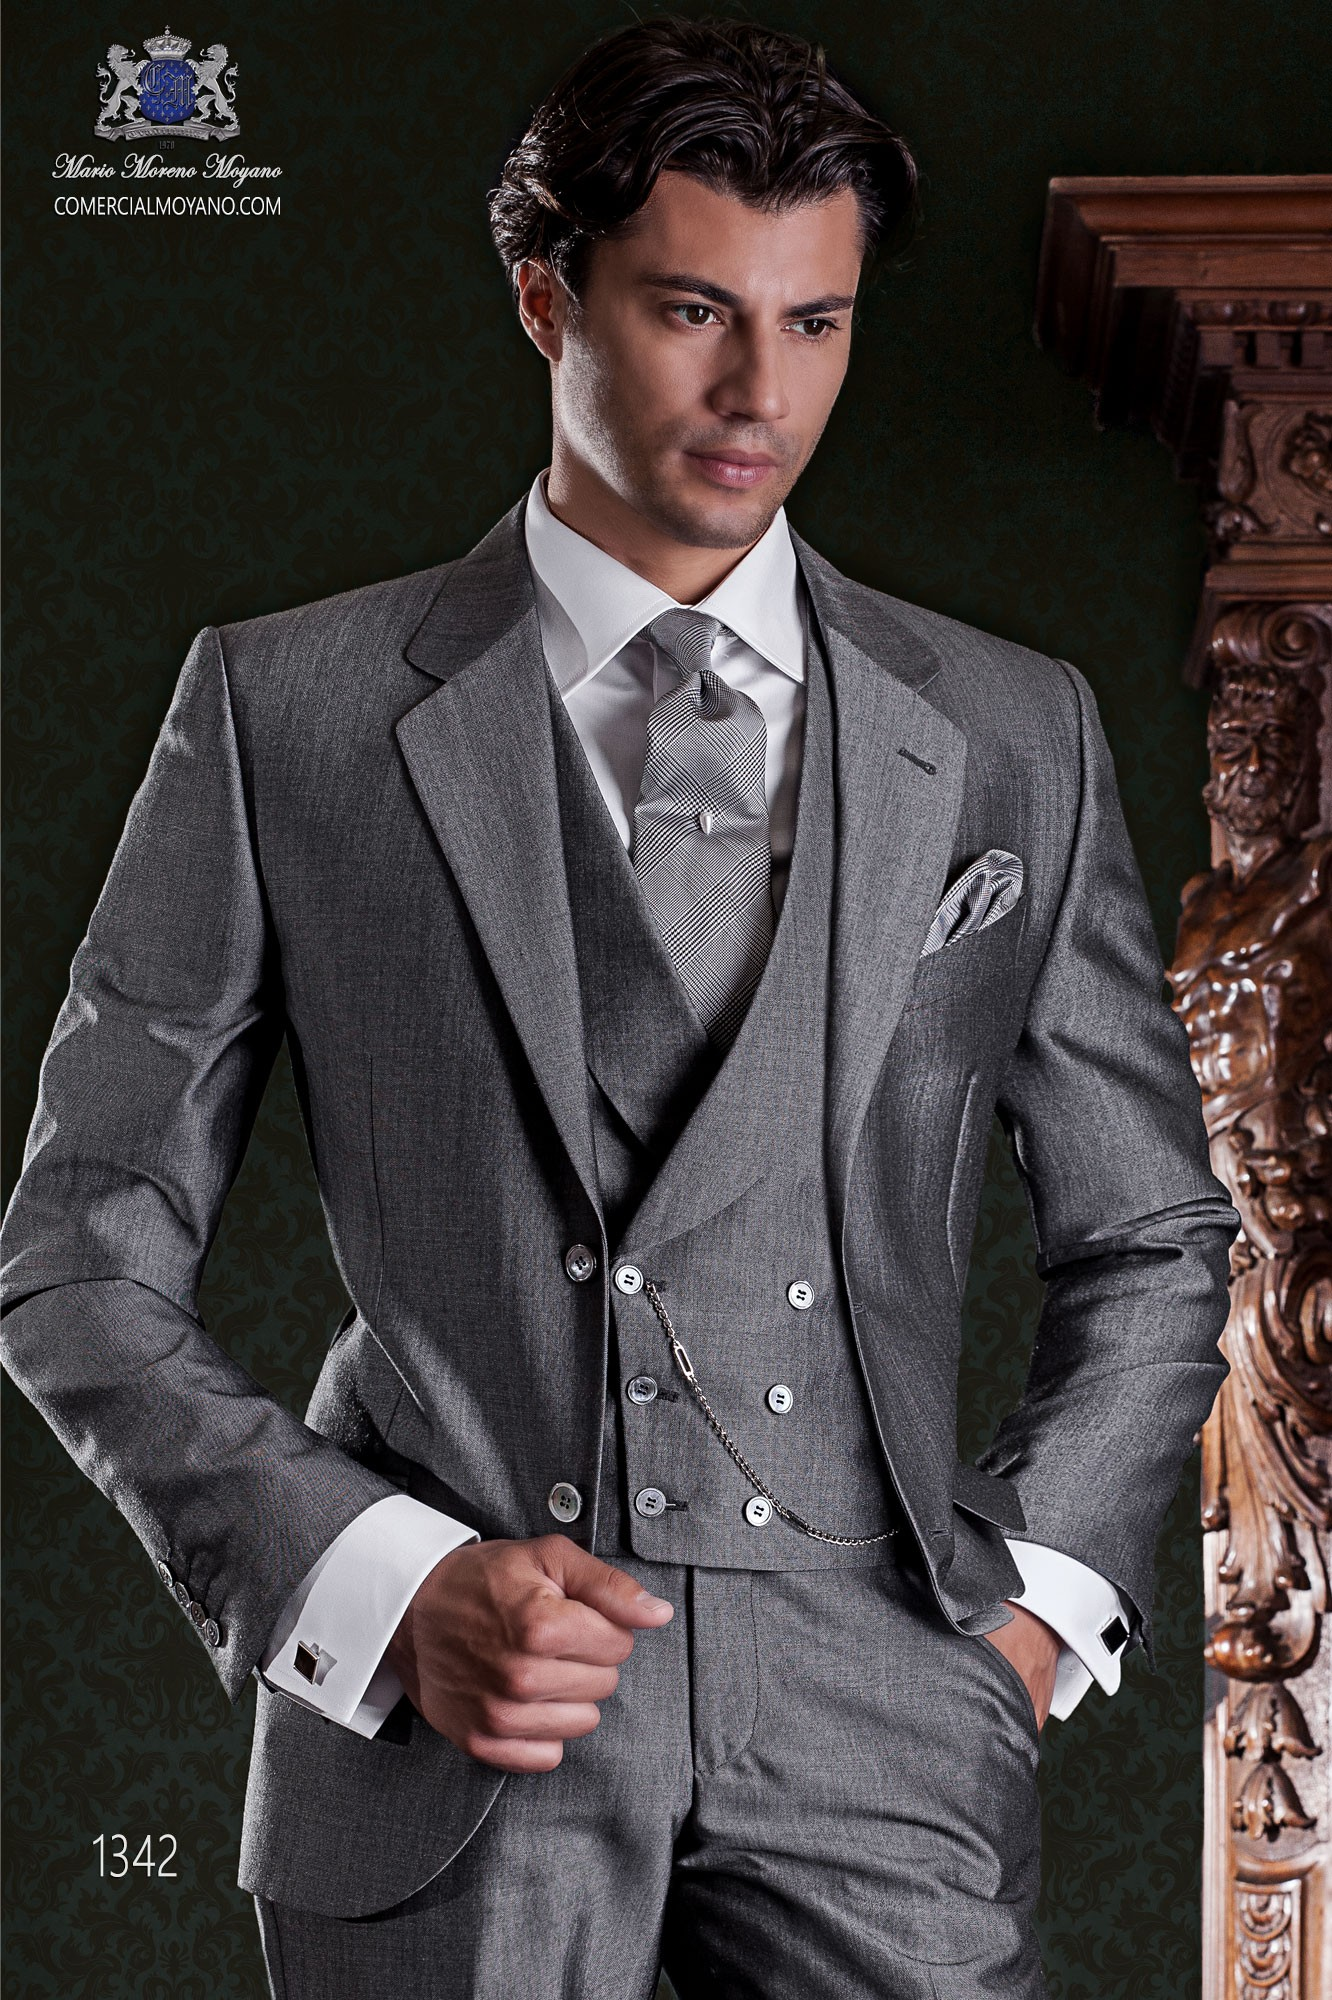 http   www.comercialmoyano.com es 1794-traje-. MODELO 1342 OTTAVIO NUCCIO  GALA. Traje de novio clásico italiano gris mixto lana mohair alpaca. 0fd380cf480e